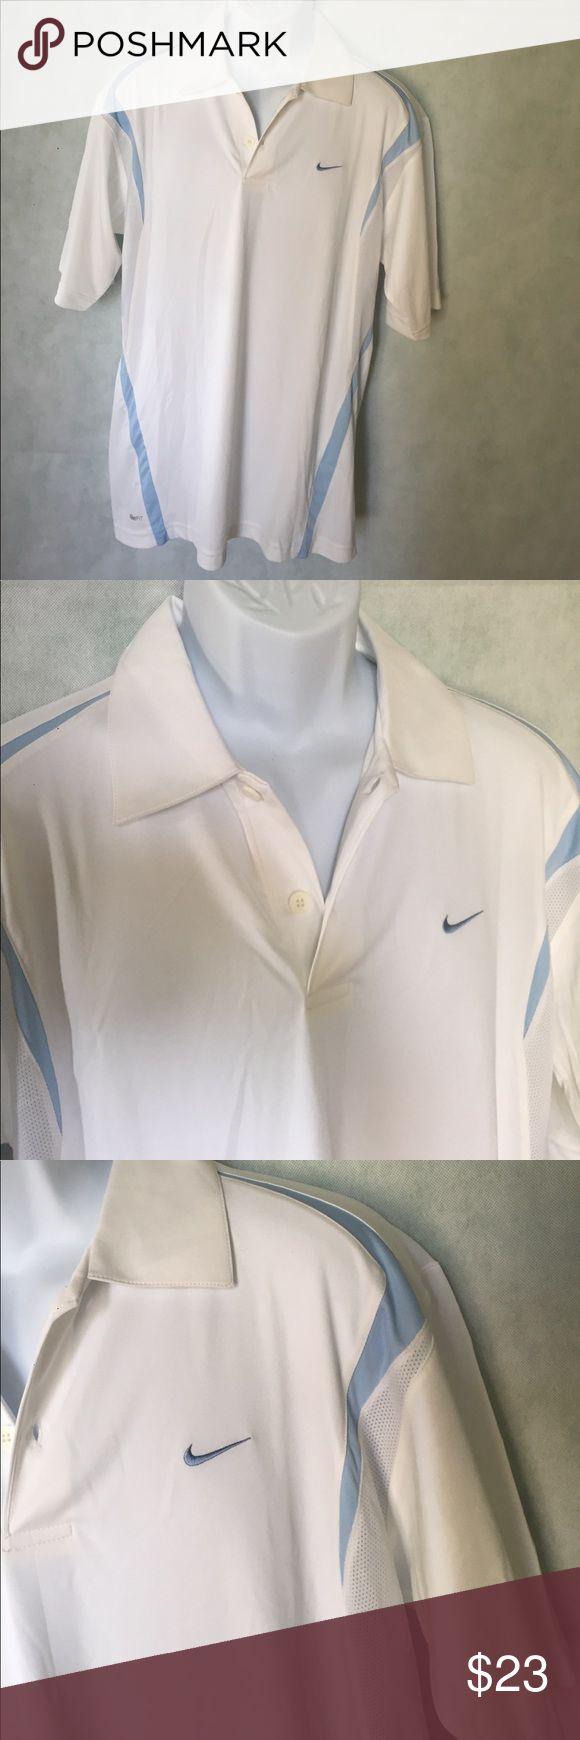 Nike Fit Men's Sports Polo Shirt Size X-L New Brand new Nike polos shirt for men. Nike Shirts Polos